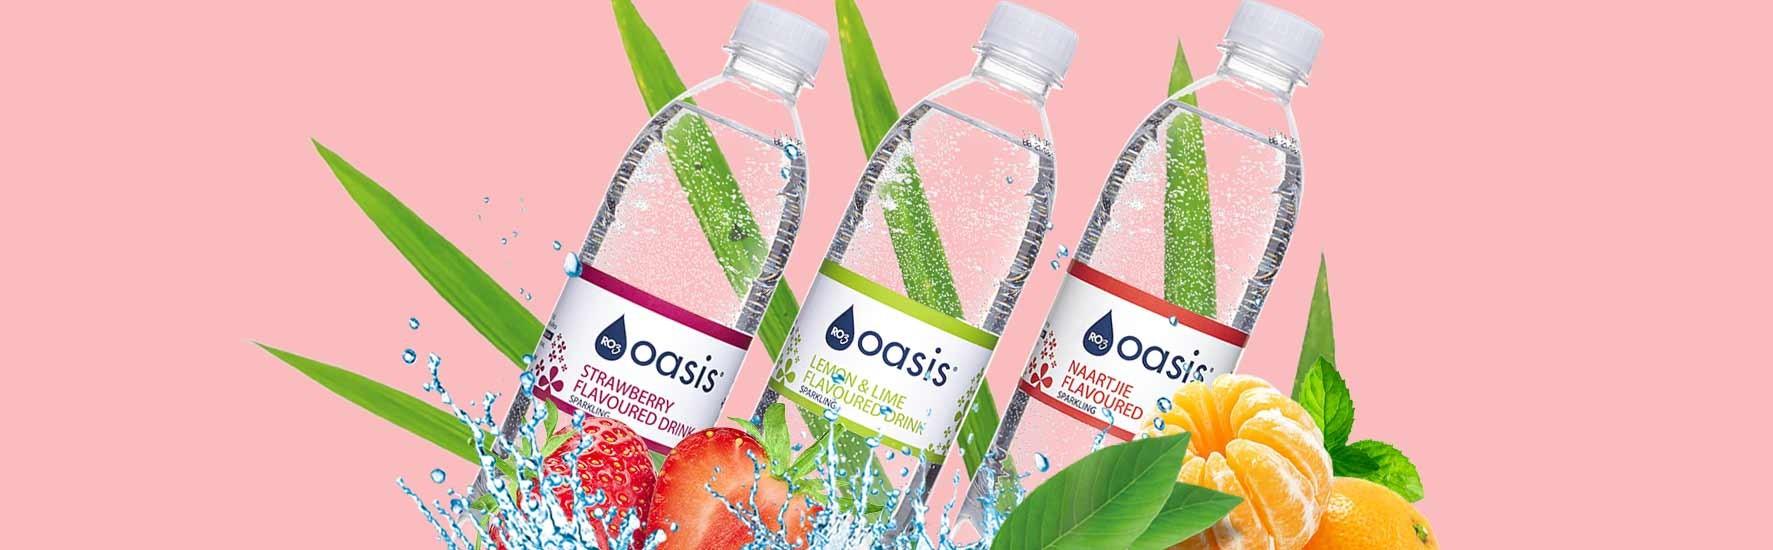 Oasis Water | LinkedIn